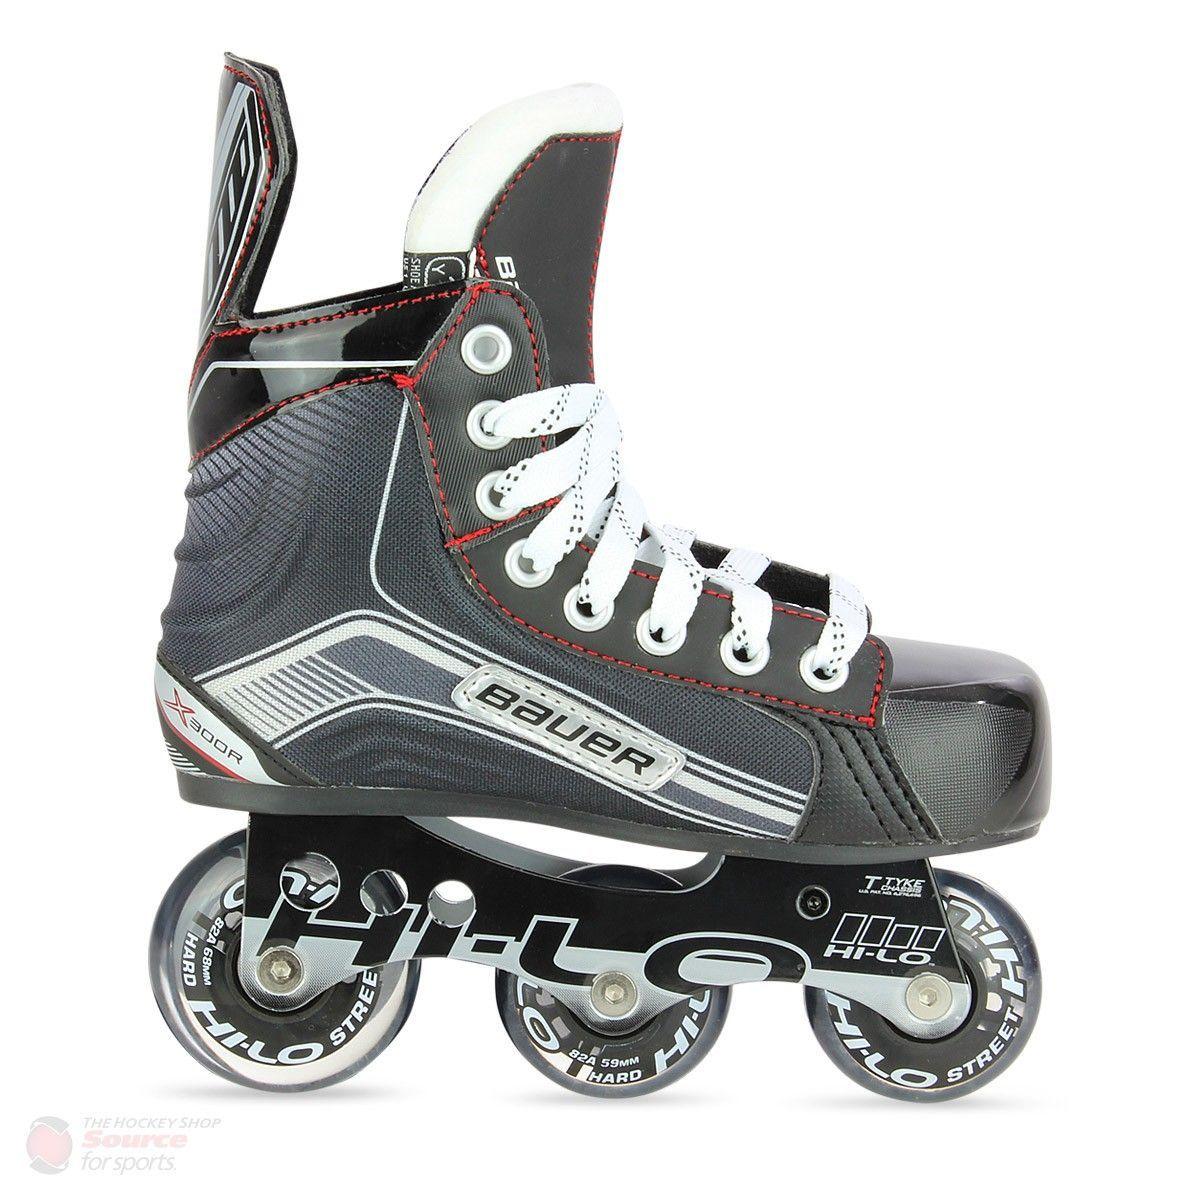 Kunststoff Hockey Skates Bauer Vapor Jugend Inline Junior Equipment Stuff Ice Skate Blades Ersatz Hohe Qualitat G Inline Hockey Roller Hockey Skates Hockey Bag